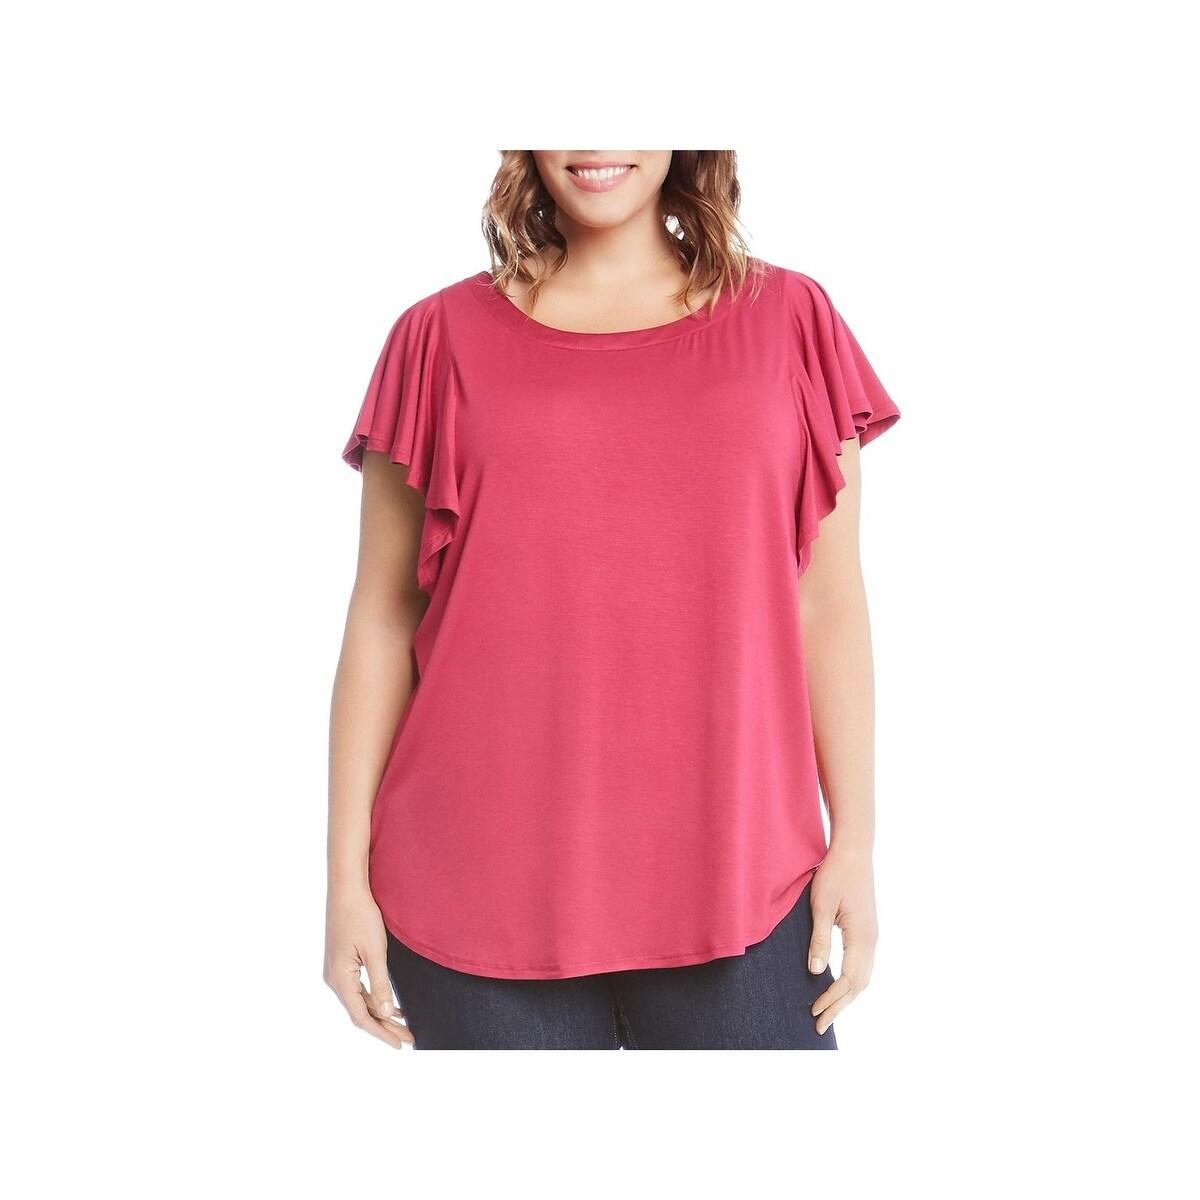 Espresso Women Plus Size 2x 3x Hi Lo Black Yellow Check Tee Shirt Top Blouse